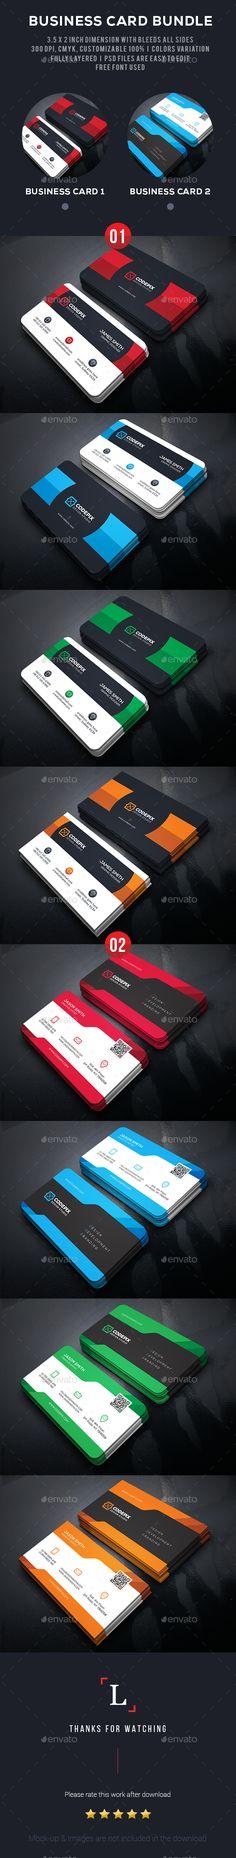 Shape Business Card Template PSD Bundle. Download here: http://graphicriver.net/item/shape-business-card-bundle/15574775?ref=ksioks